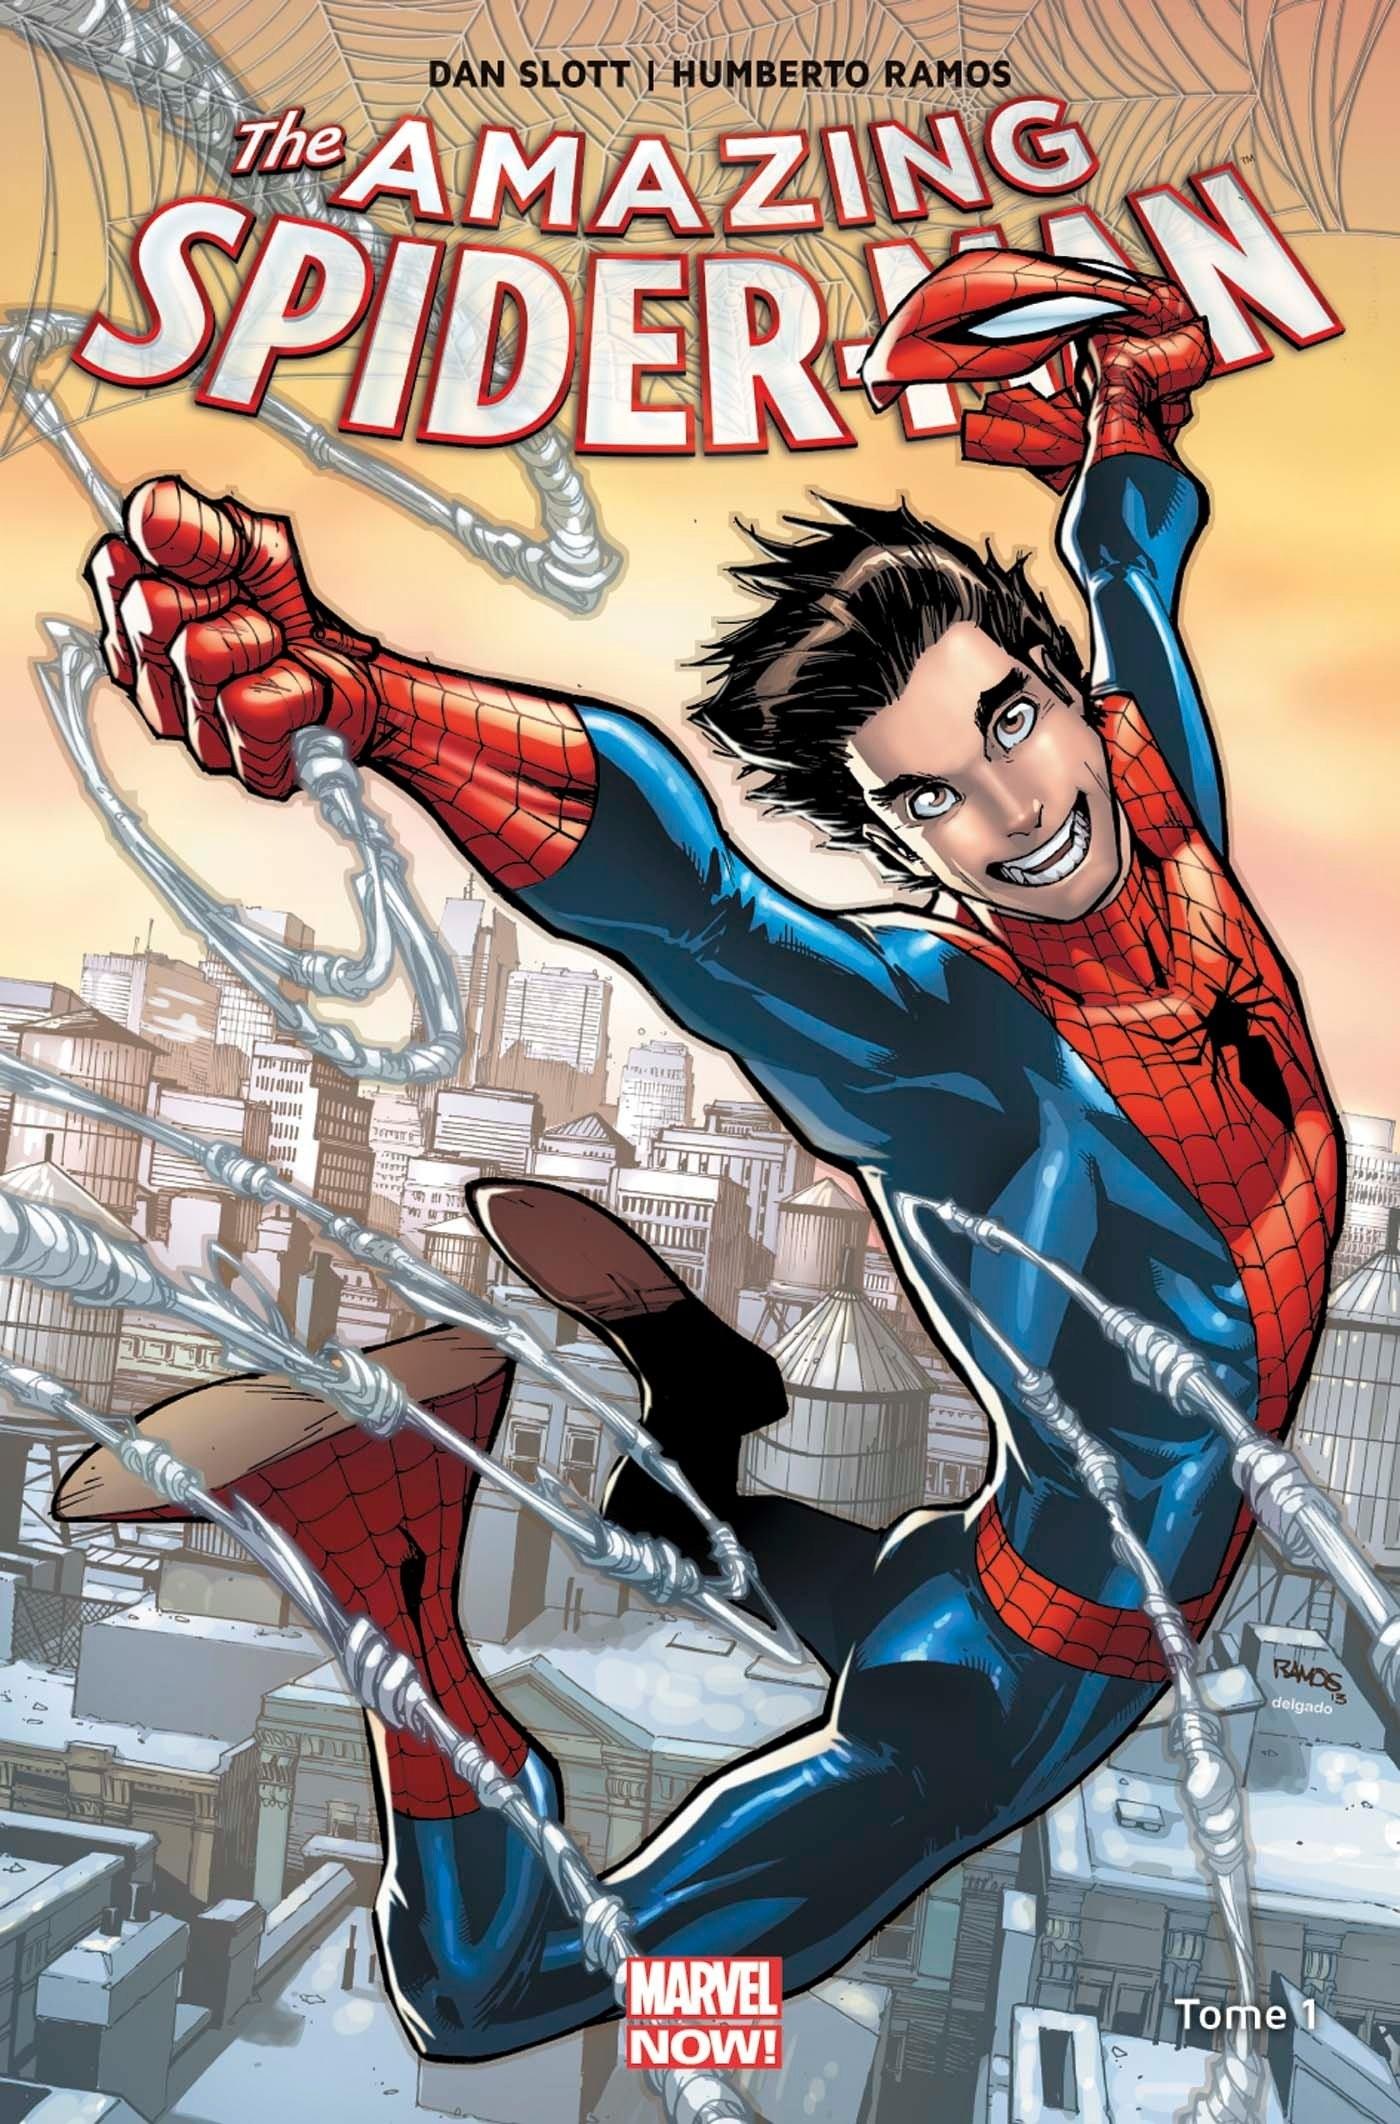 AMAZING SPIDER-MAN MARVEL NOW T01 (VF) cartonné